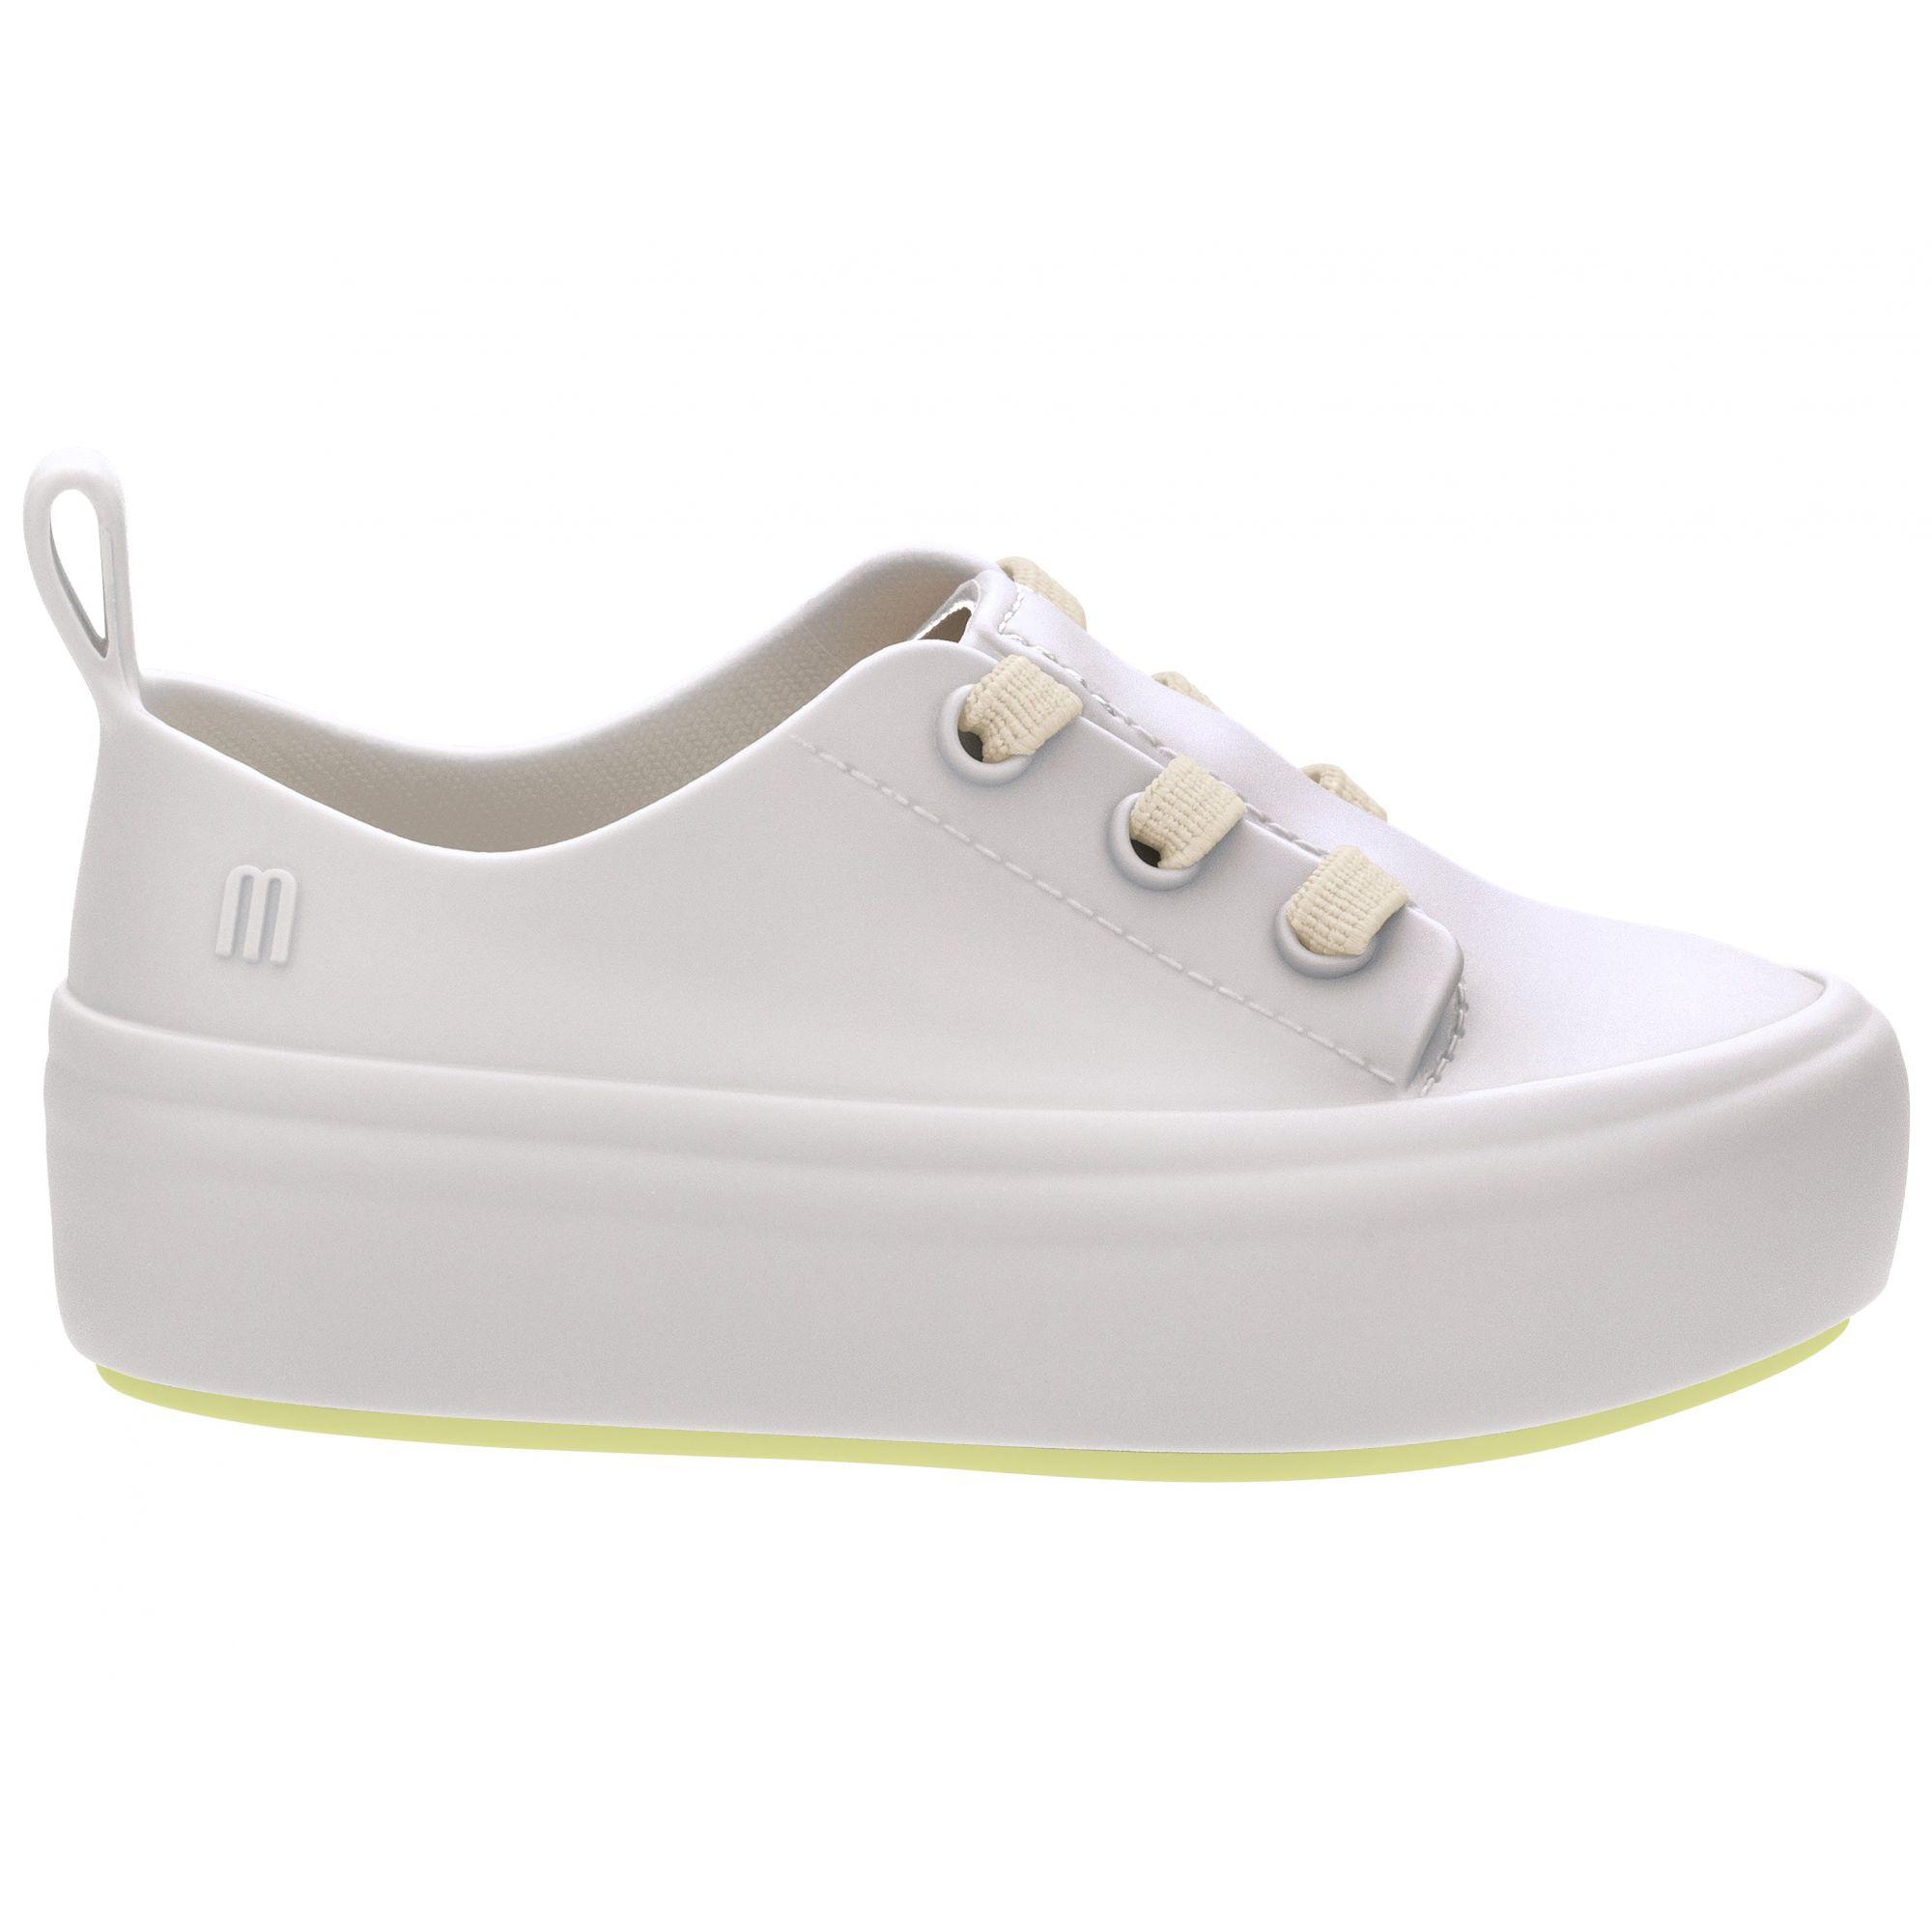 Mini Melissa Ulitsa Sneaker Bege Amarelo